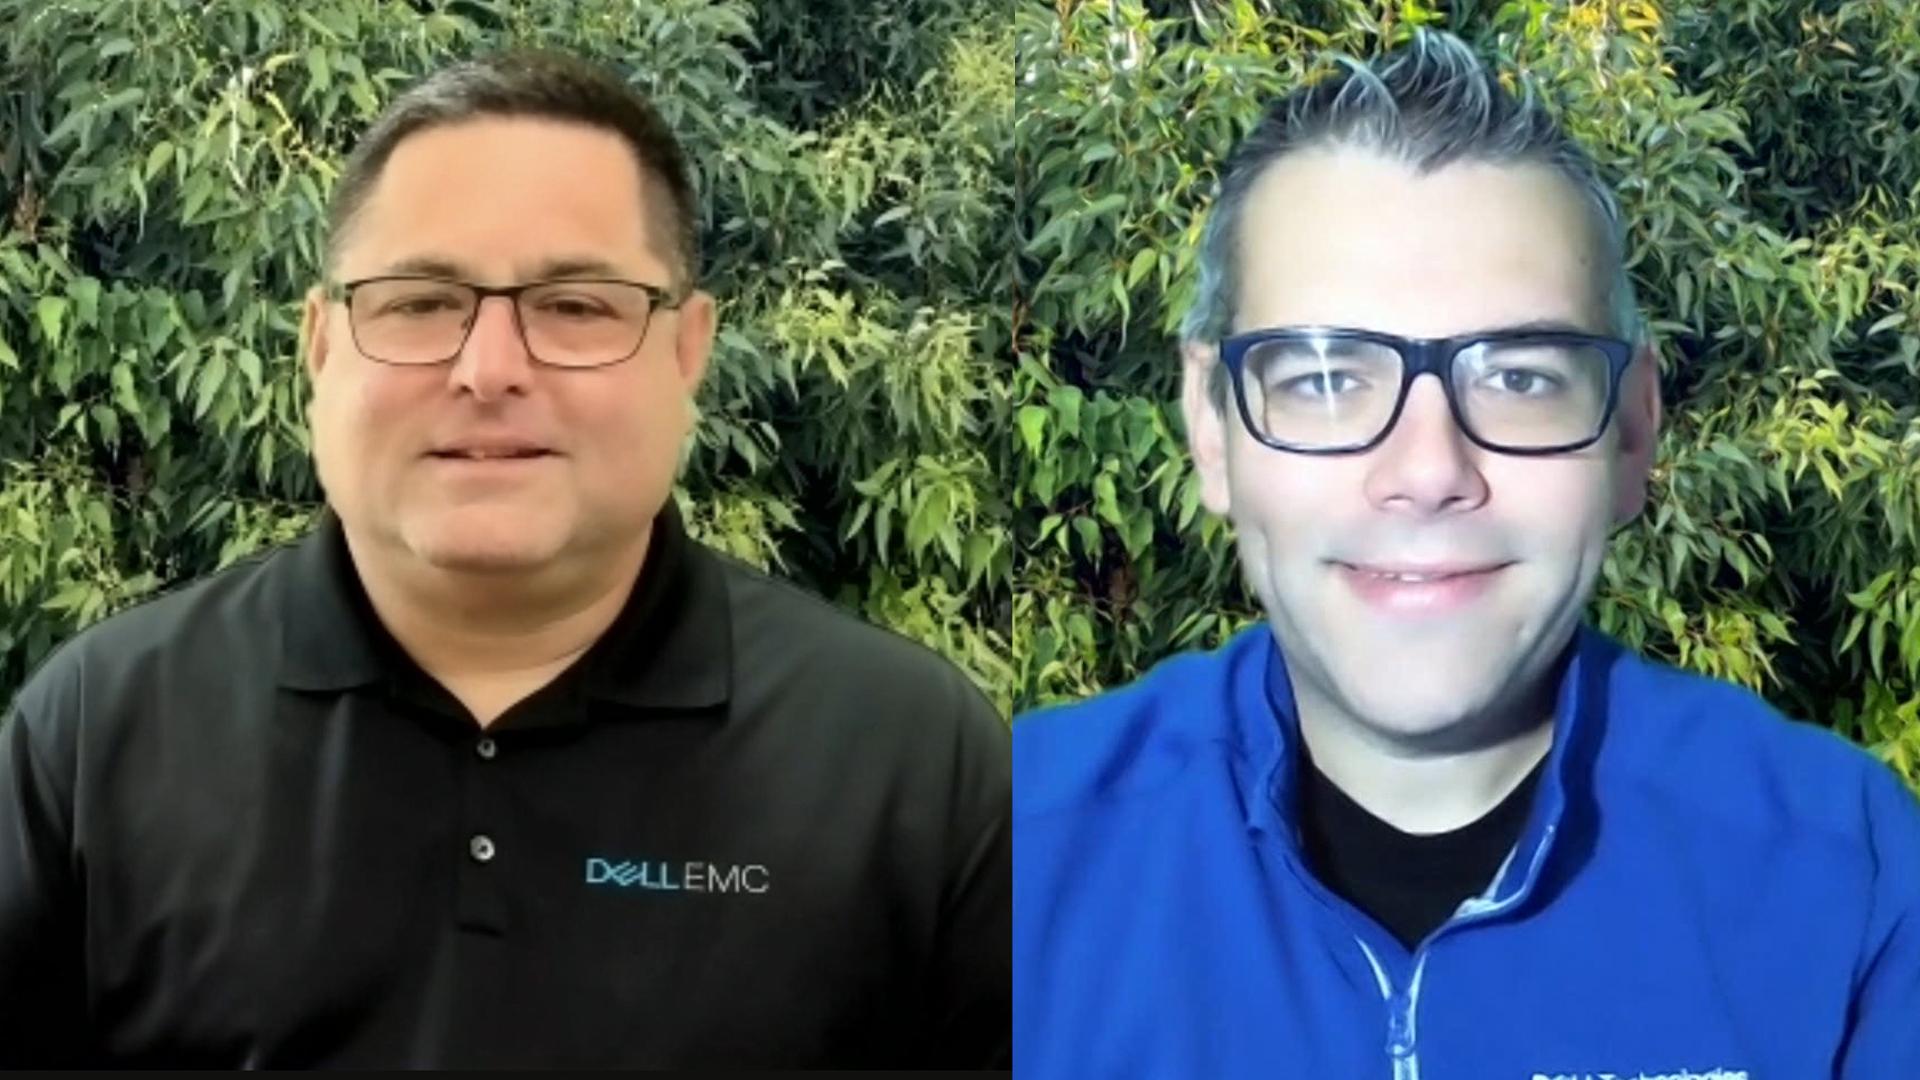 Dell tackles main pitfalls of managing edge computing: complexity, security and choice - SiliconANGLE